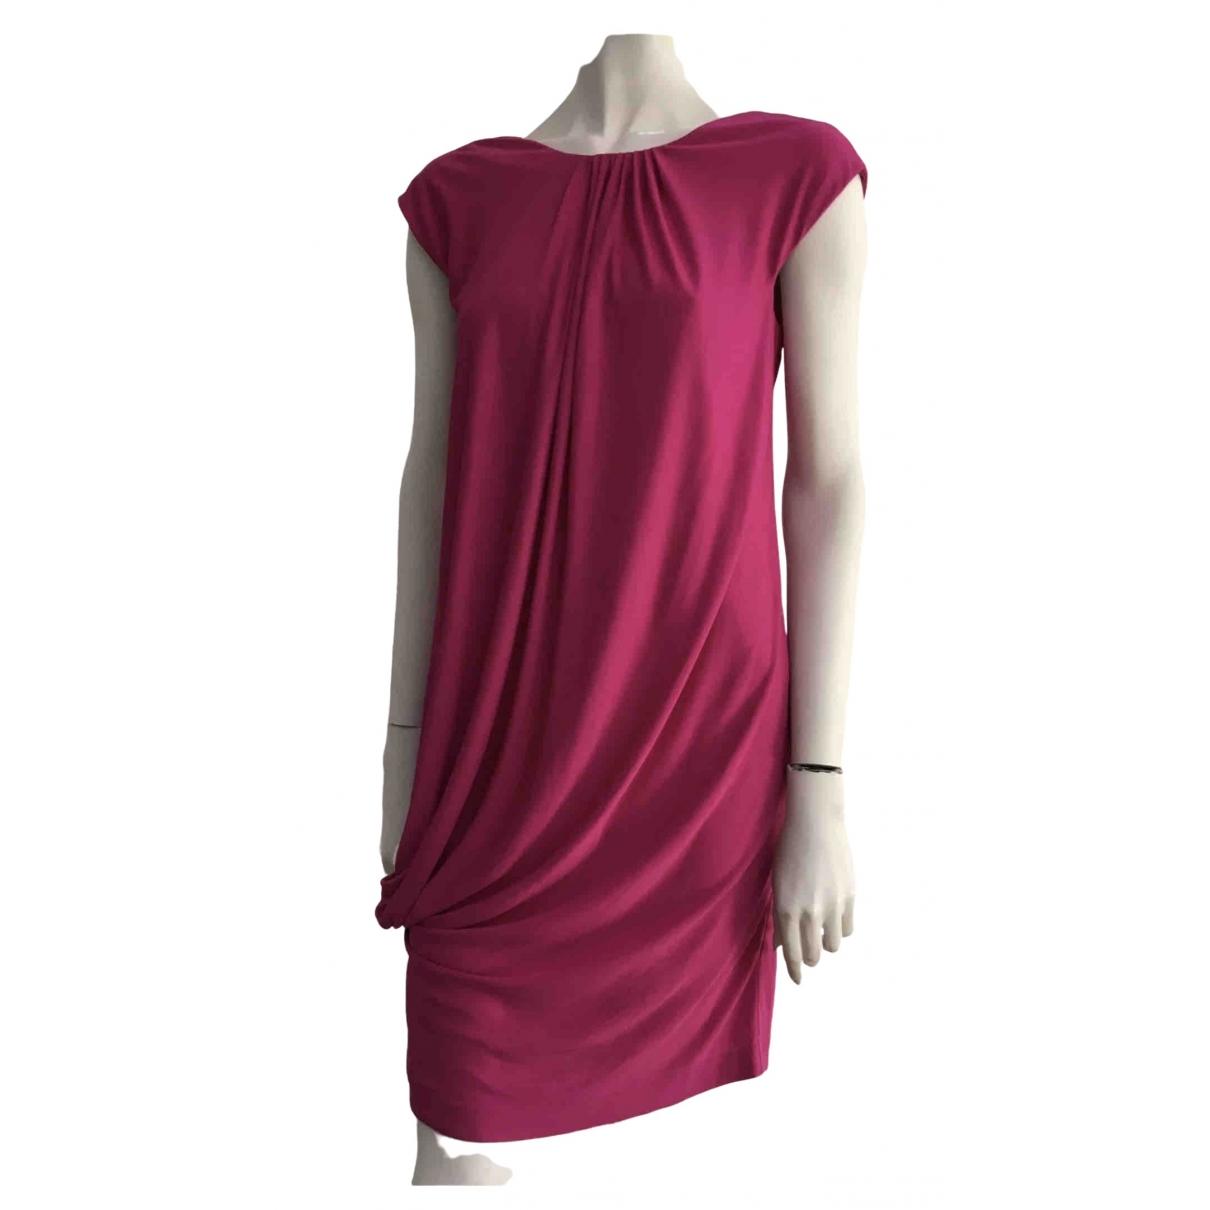 Hoss Intropia \N Pink dress for Women 36 FR